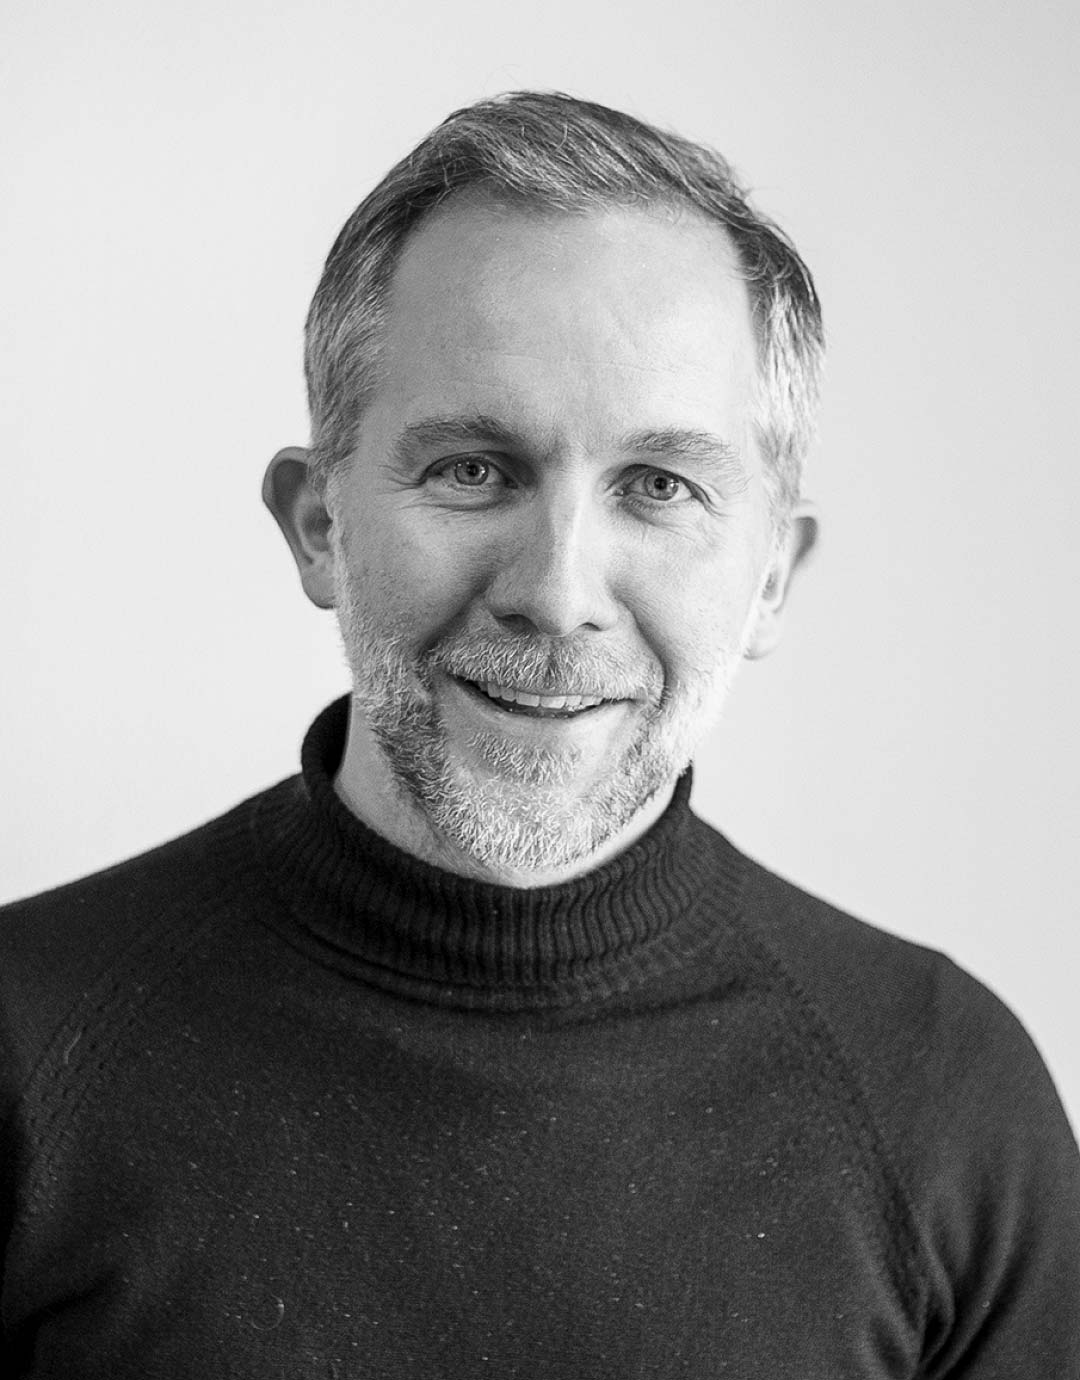 Carl Jönsson